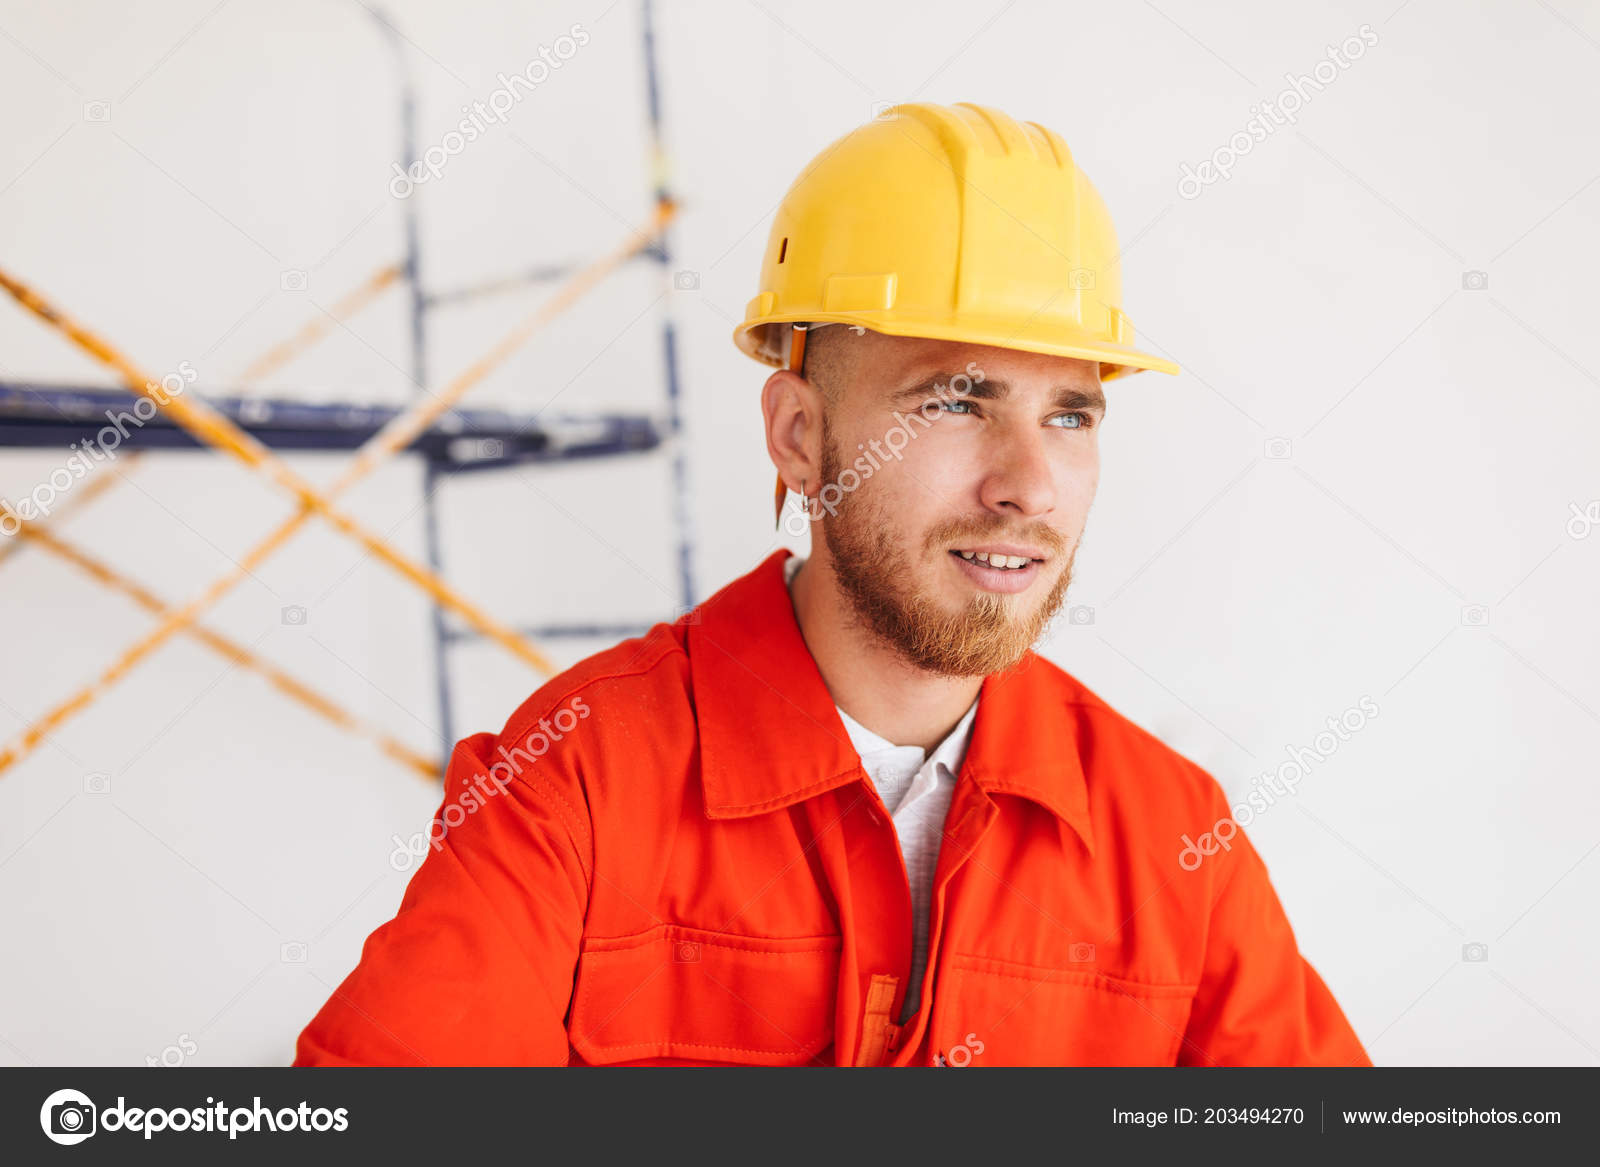 52200d612 Retrato Joven Capataz Naranja Trabajo Ropa Casco Amarillo Con Lápiz ...